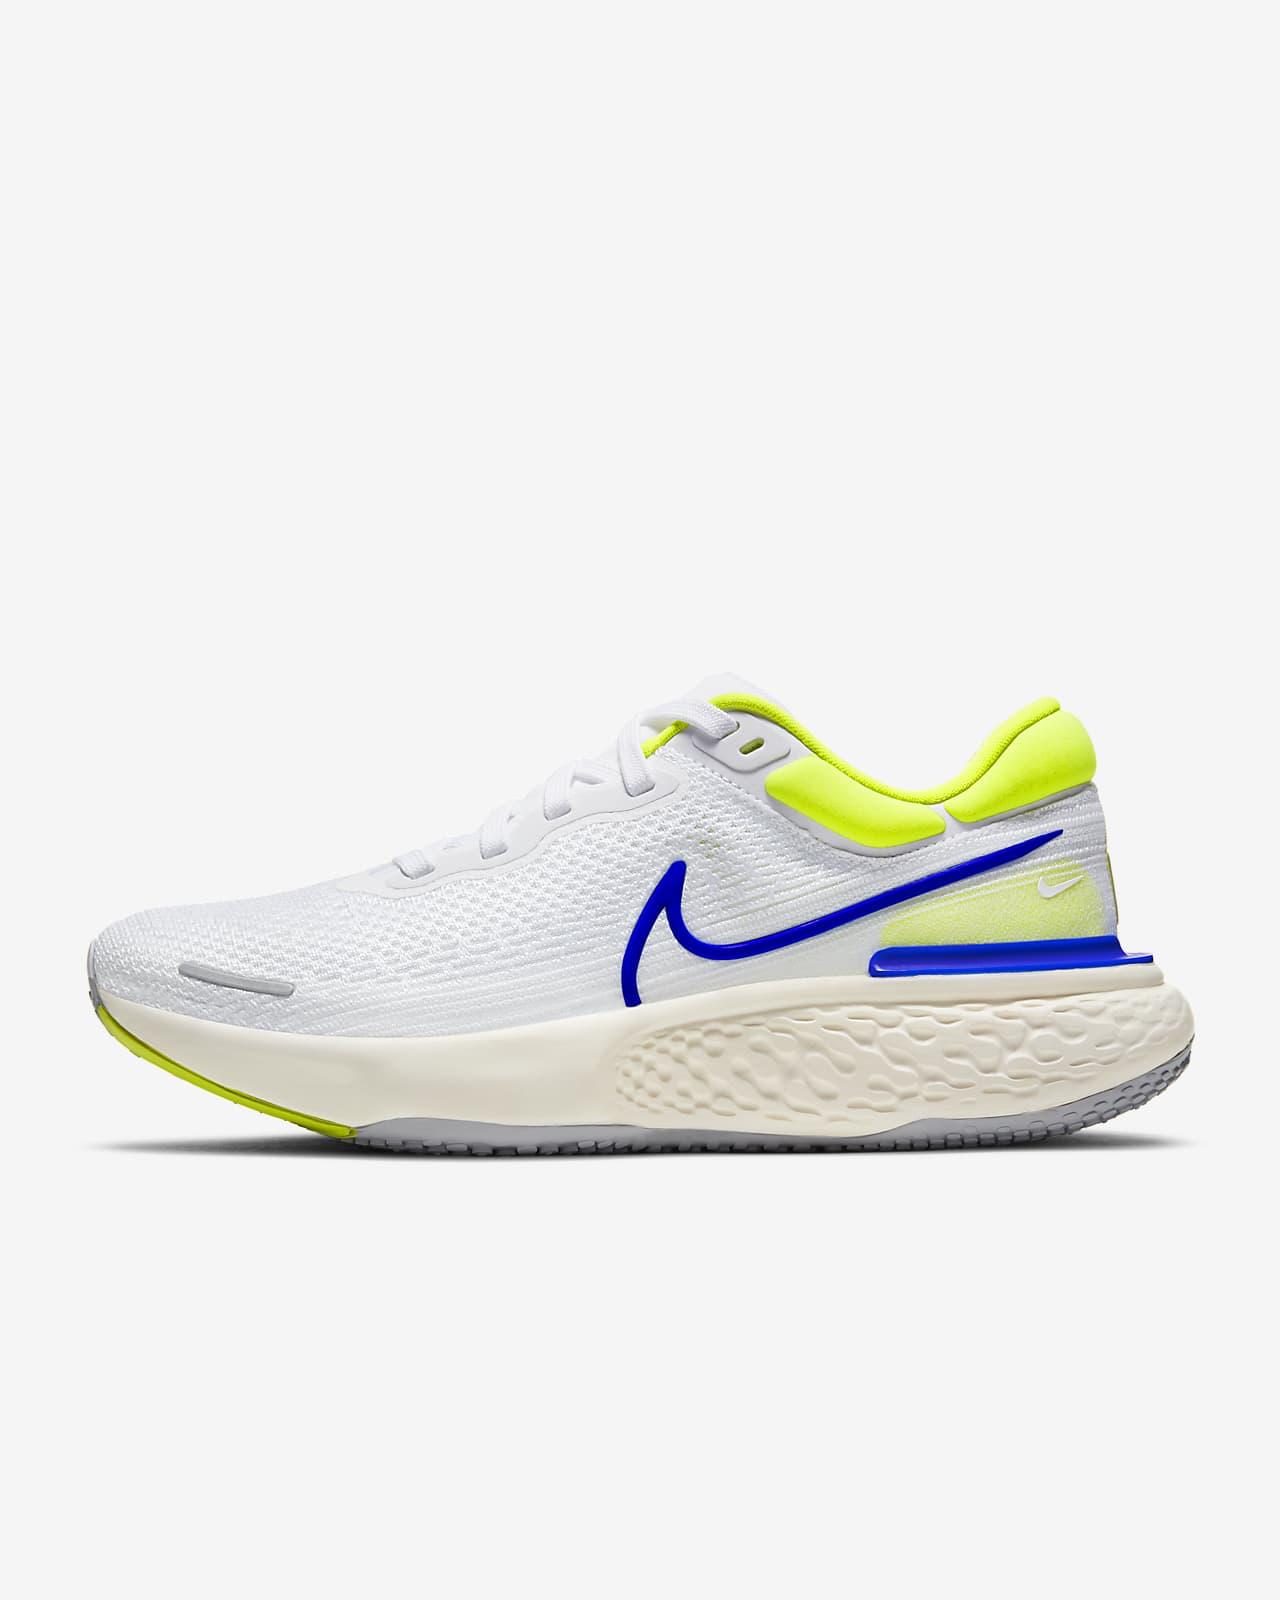 Scarpa da running su strada Nike ZoomX Invincible Run Flyknit - Uomo